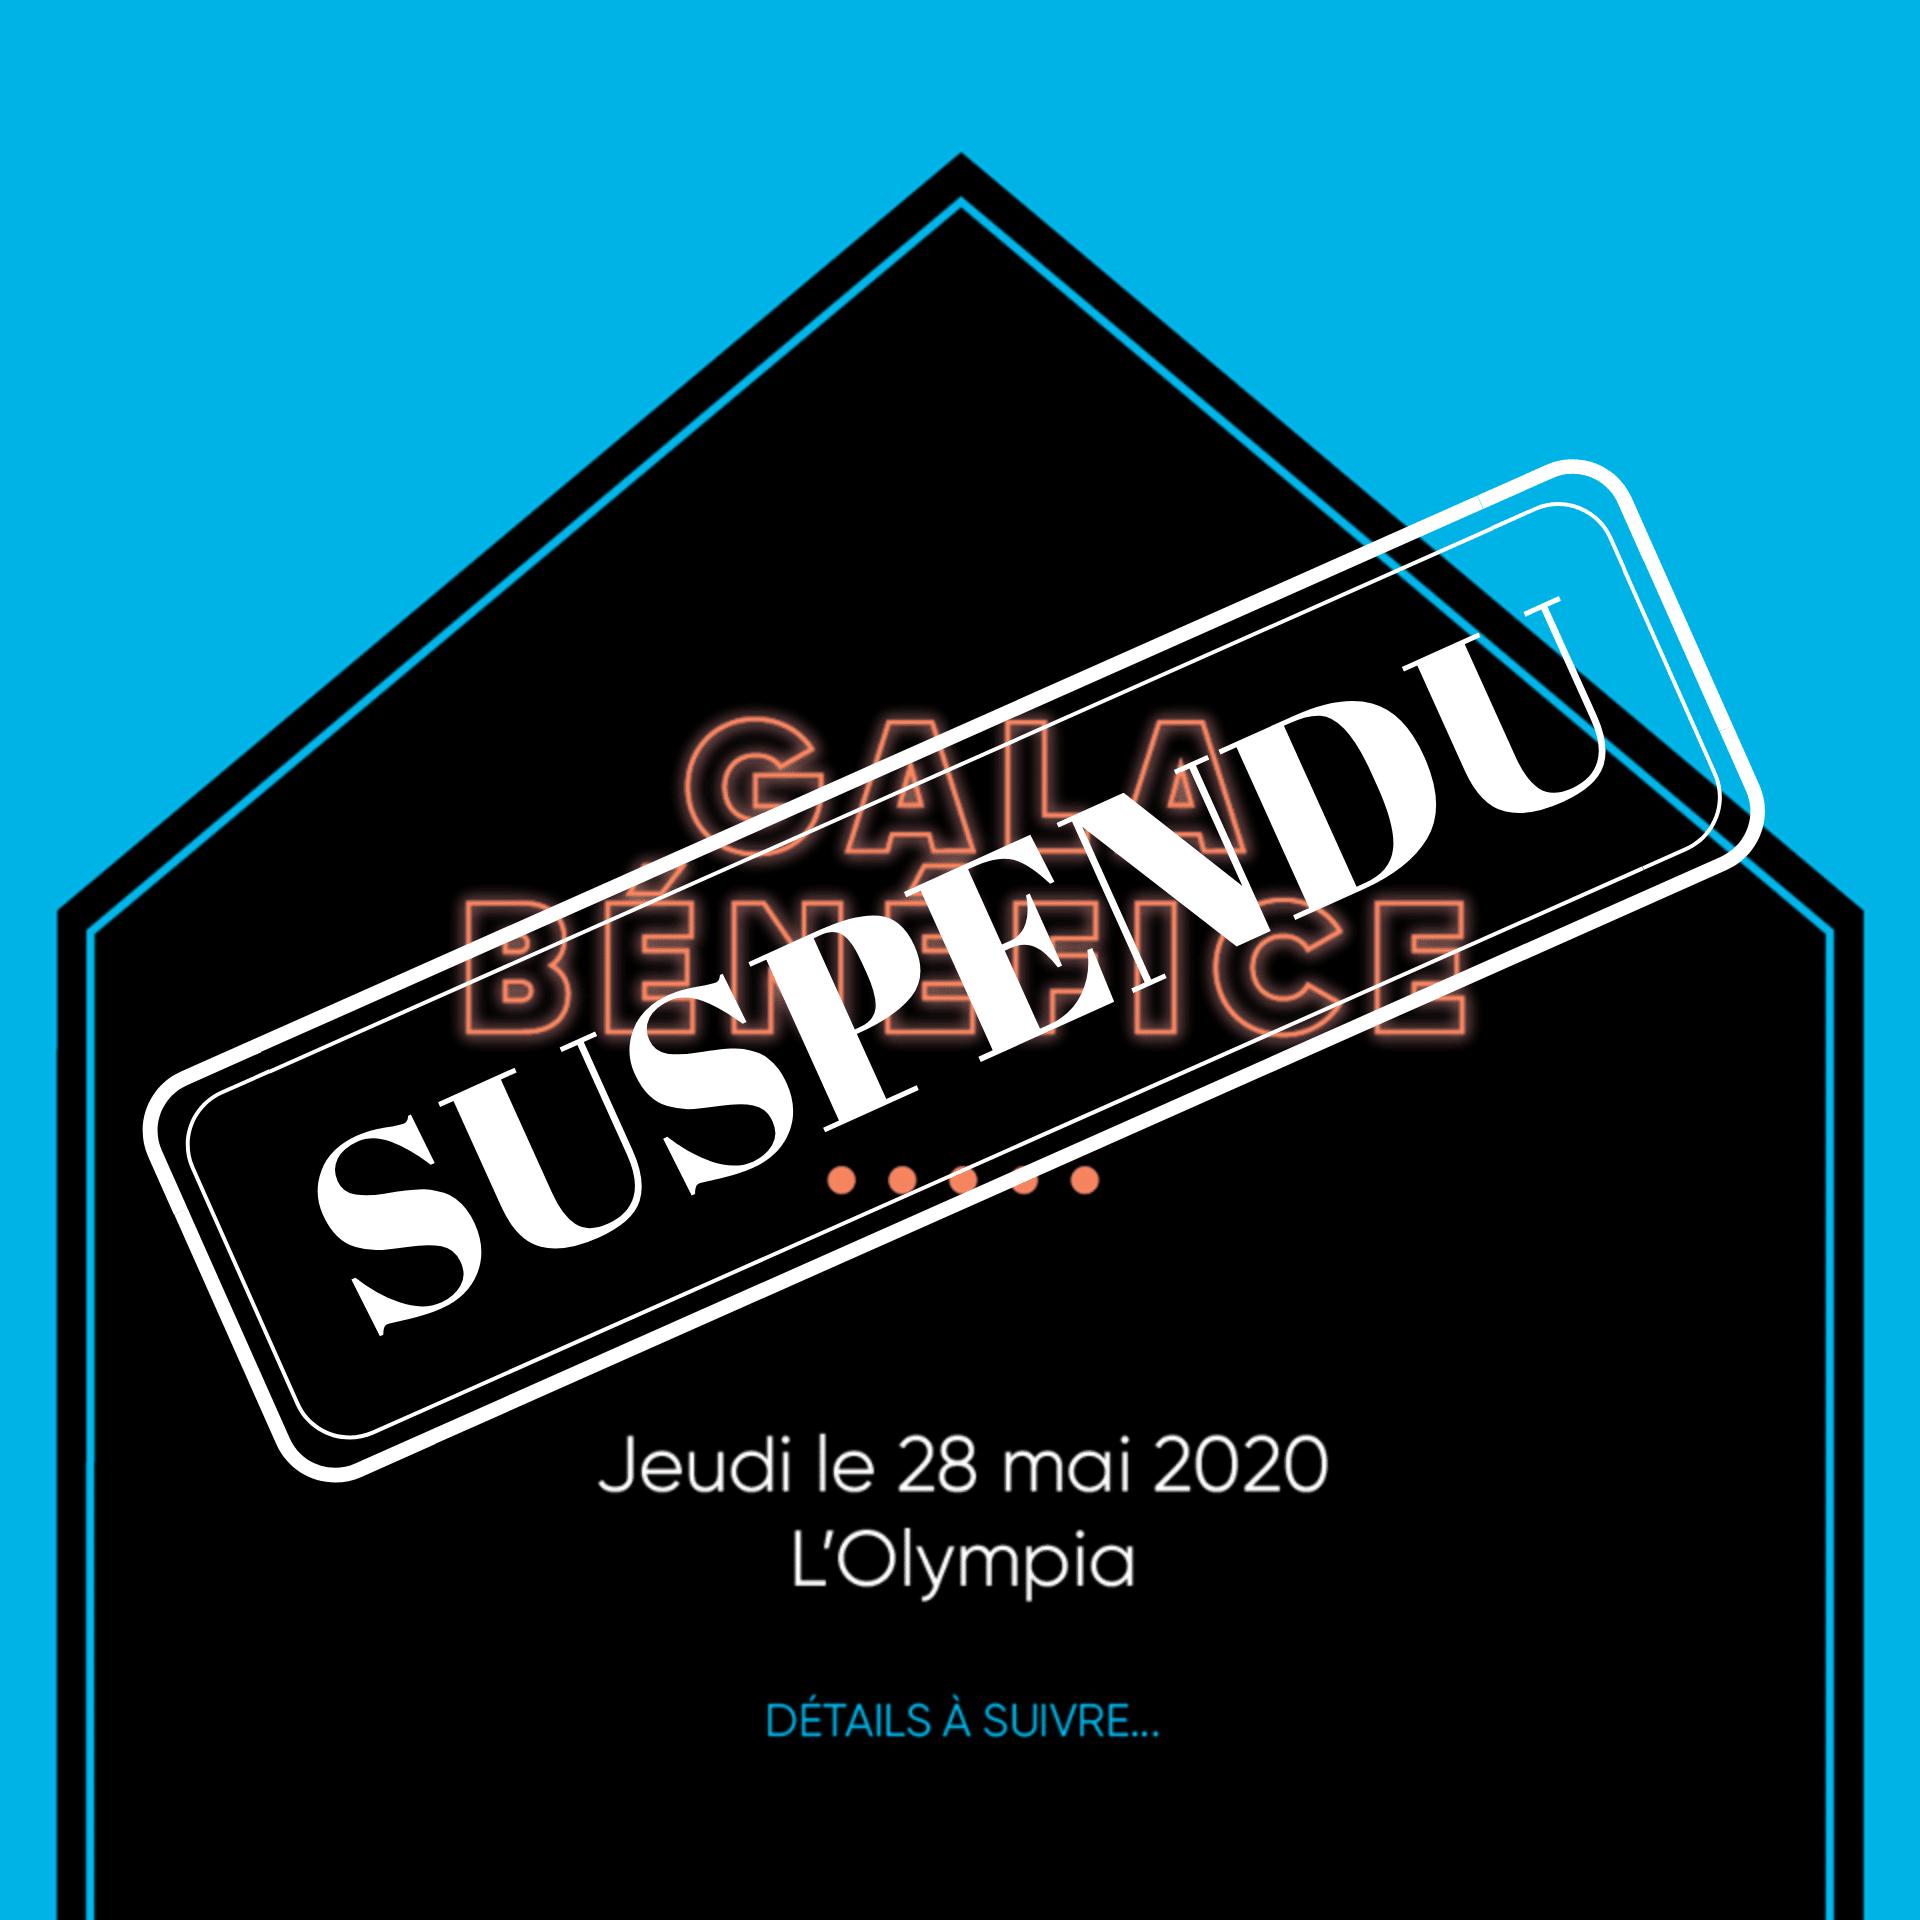 Gala 2020 - Suspendu